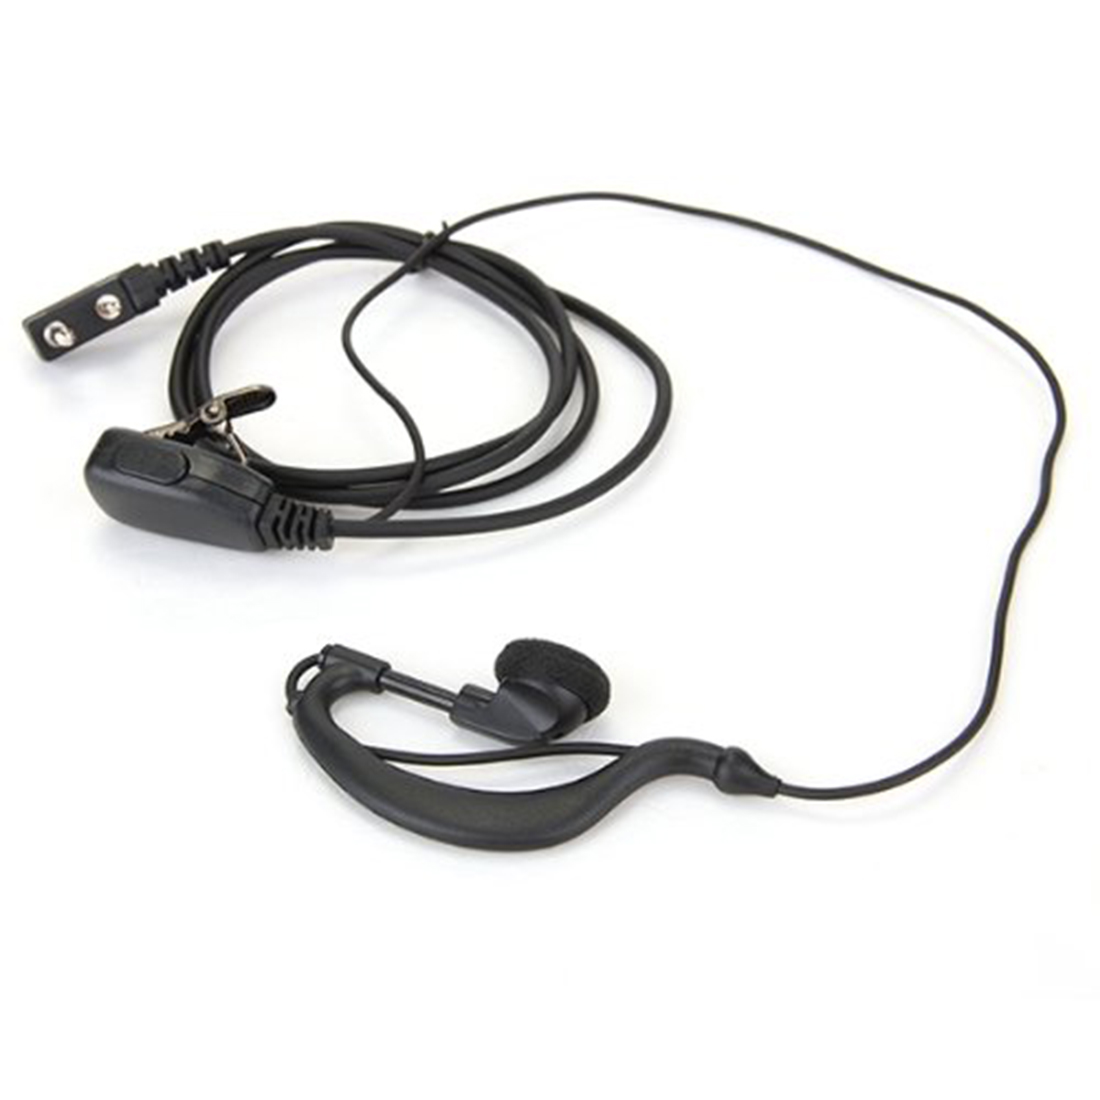 2015 de Alta Calidad Negro Earhanger Oído-Gancho Auricular Auricular Auricular p